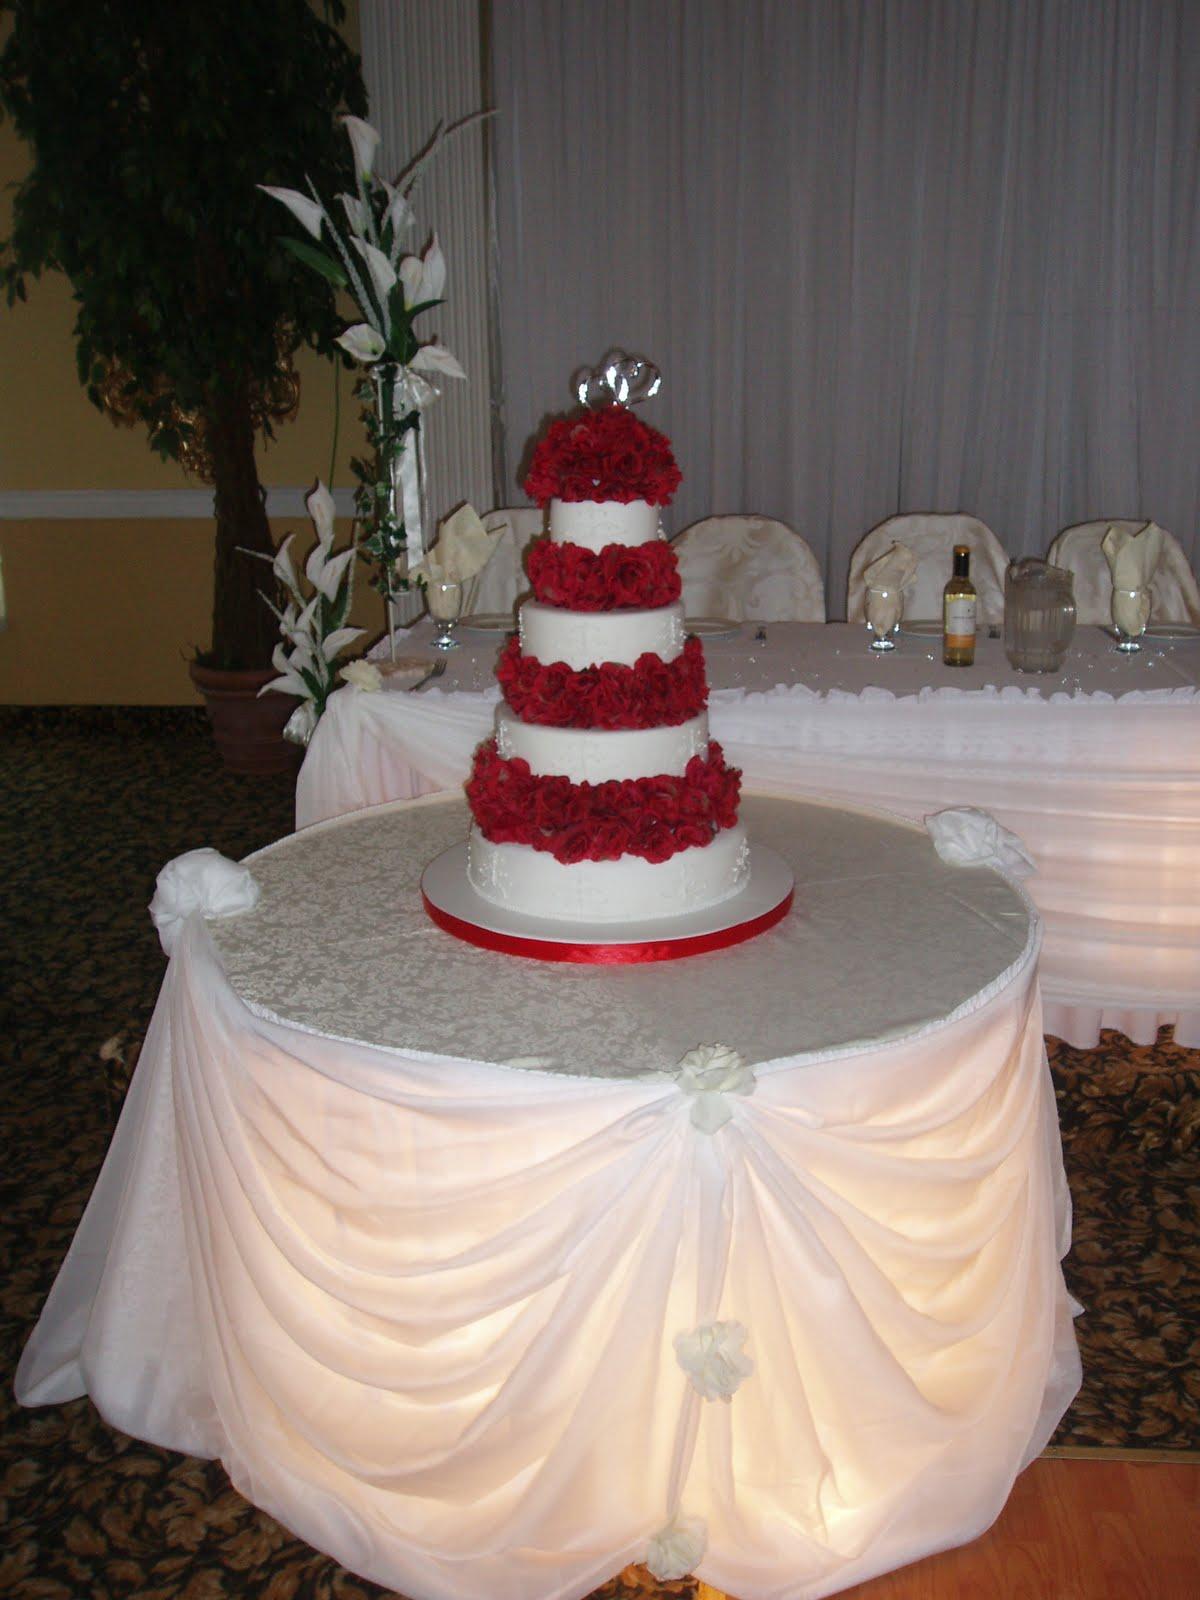 SugarBakers Cake Design: Red Roses wedding cake